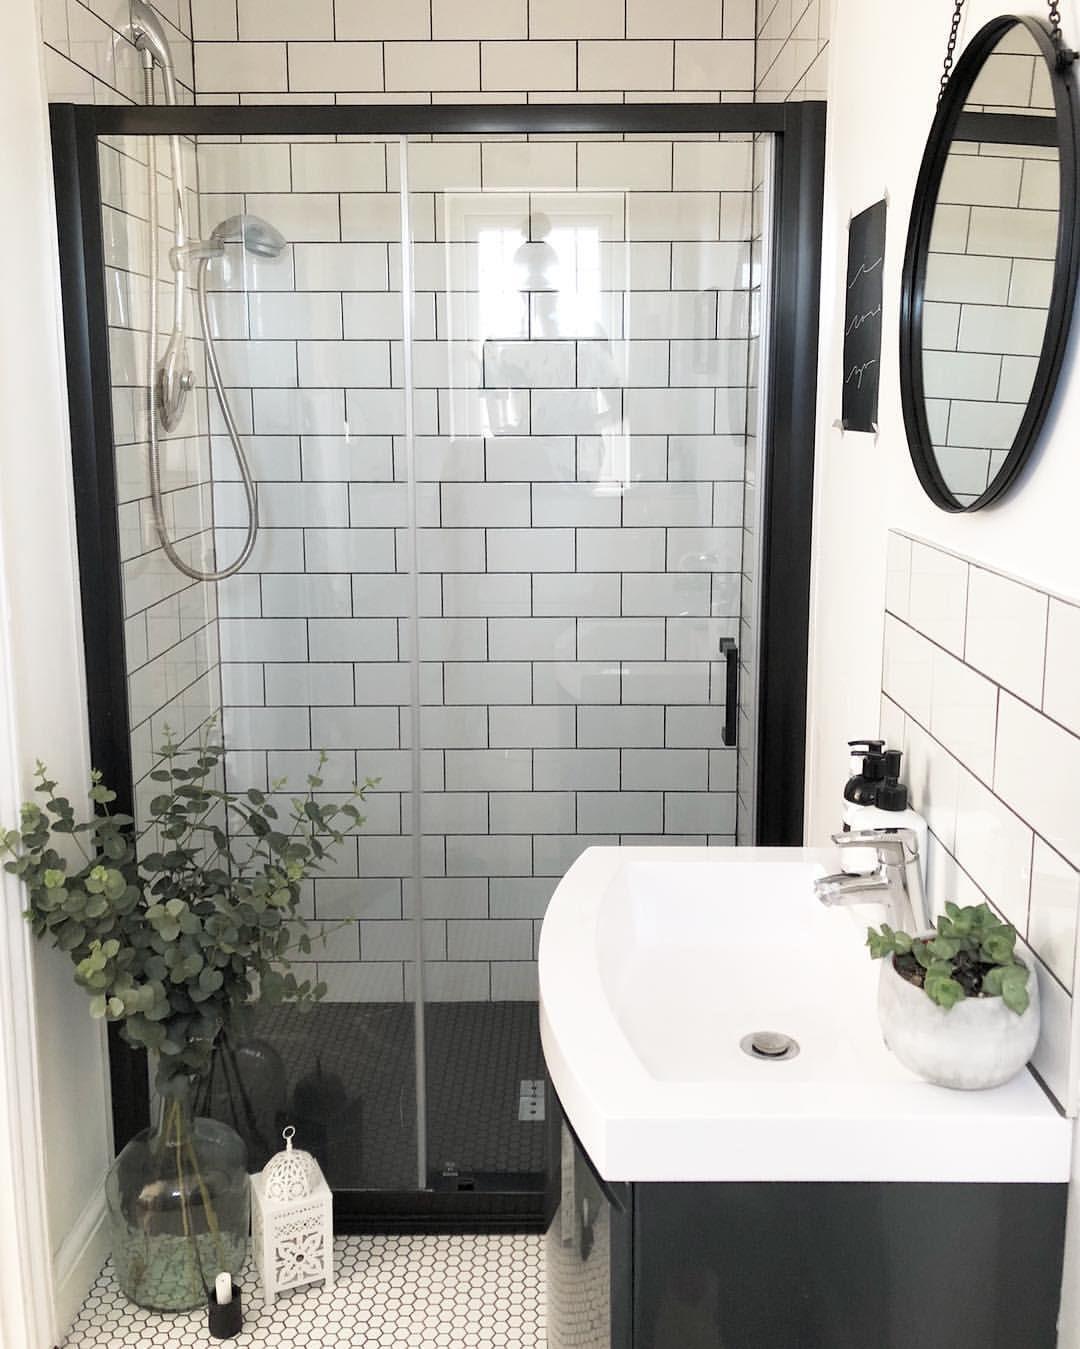 Shower Tray We Are Soak And Shower Screen Victoria Plumb Chic Bathroom Decor Modern Bathroom Design Bathroom Cabinets Designs